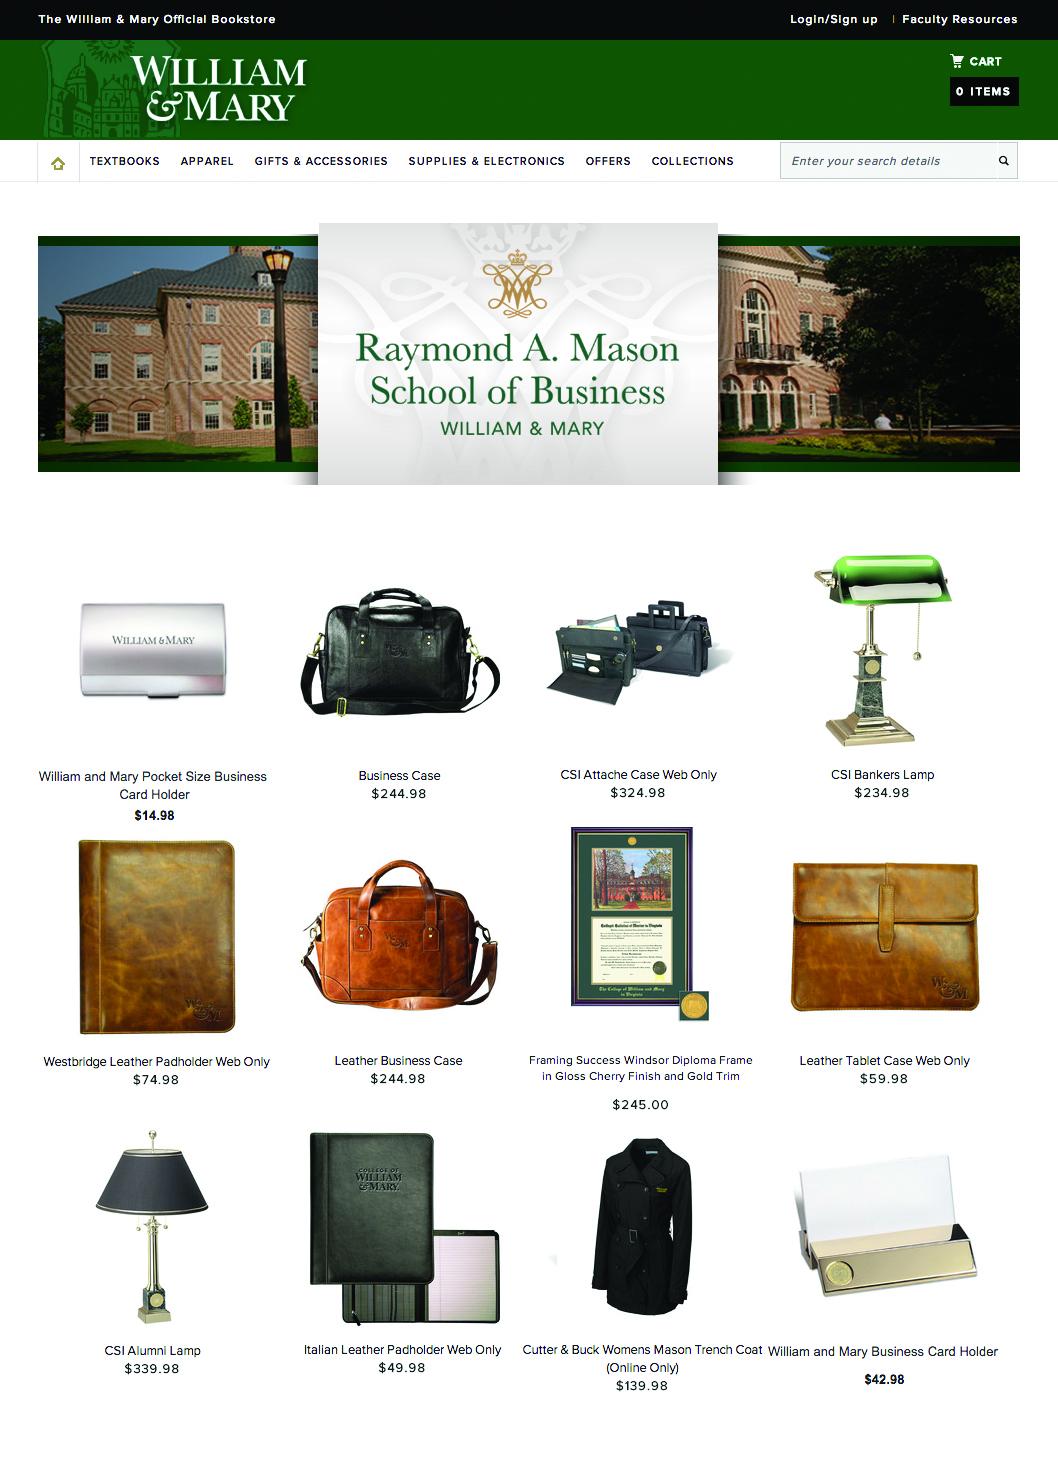 WM Alumni business